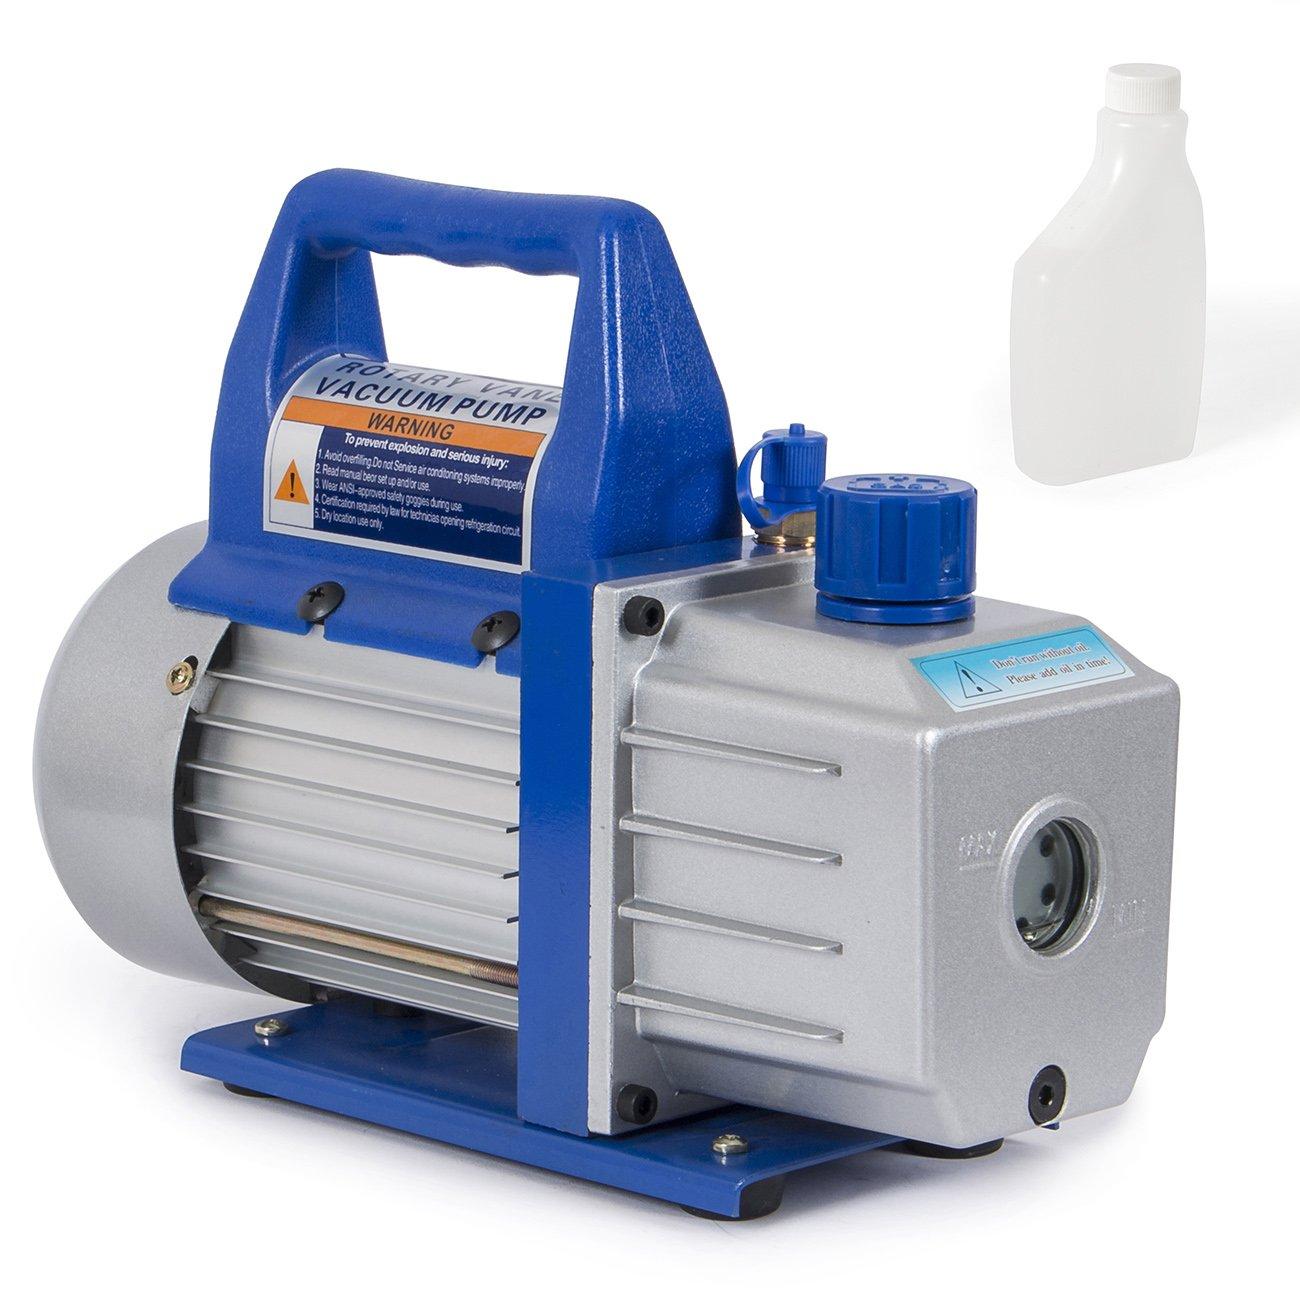 ARKSEN Single Stage, Rotary Vane Electric Vacuum Pump HVAC w/Vacuum Oil Bottle, 1/3 HP, 4-CFM, Black